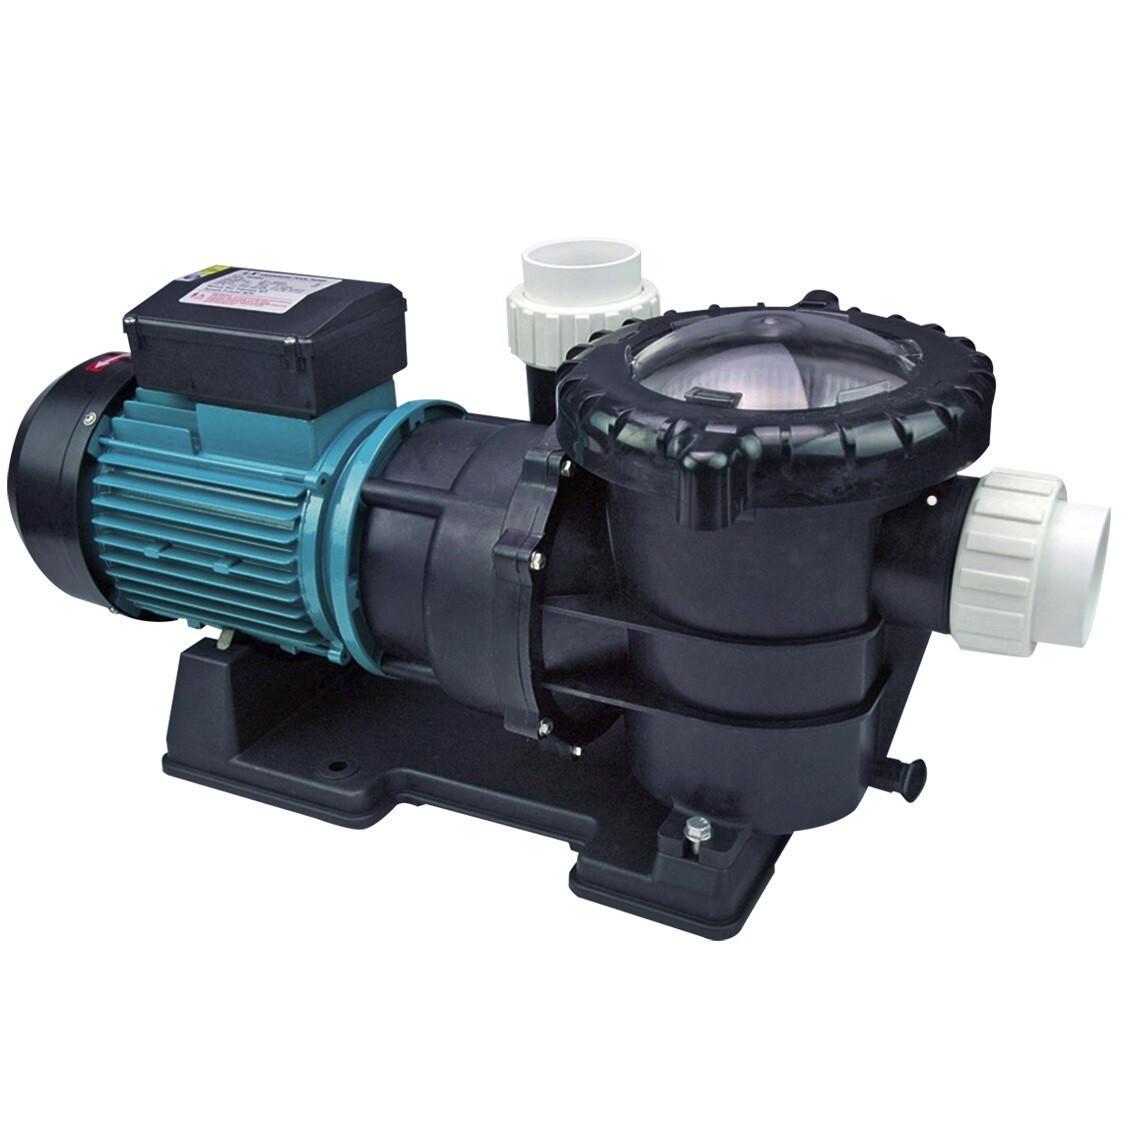 Насос AquaViva LX STP300M/VWS300M 30 м3/год (3HP, 220В)